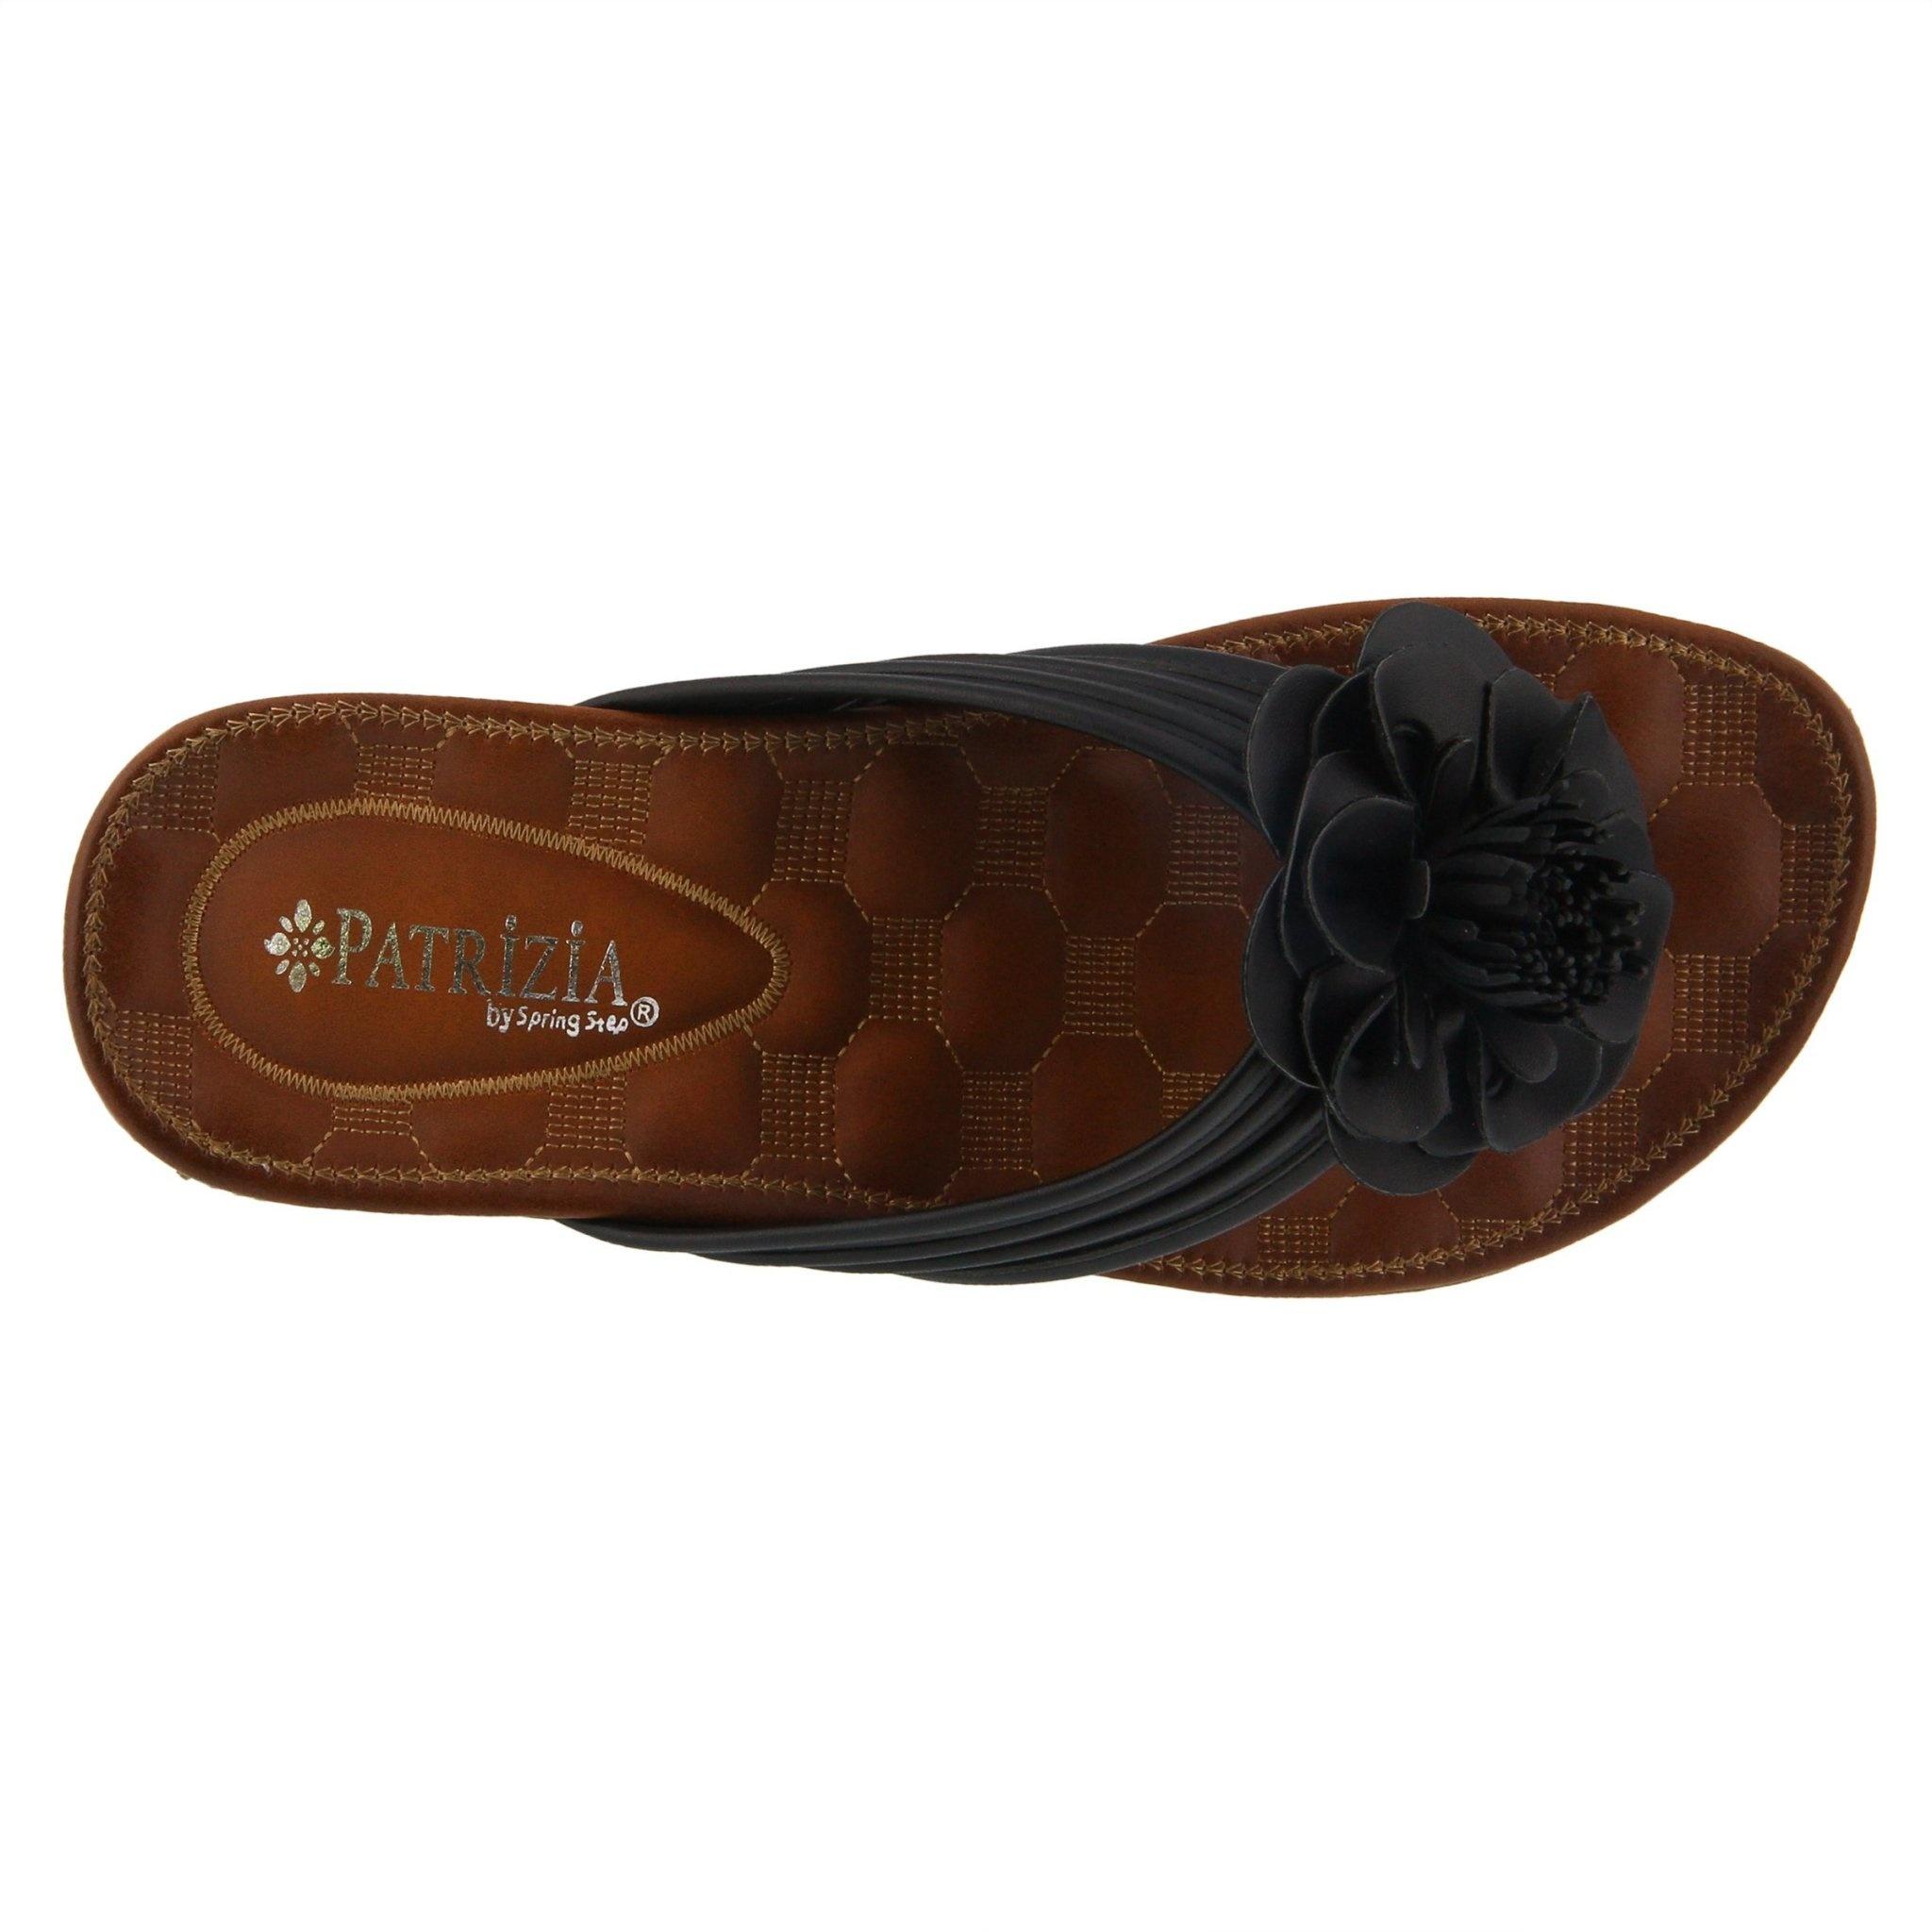 Patrizia Patrizia Cattara Sandal Black